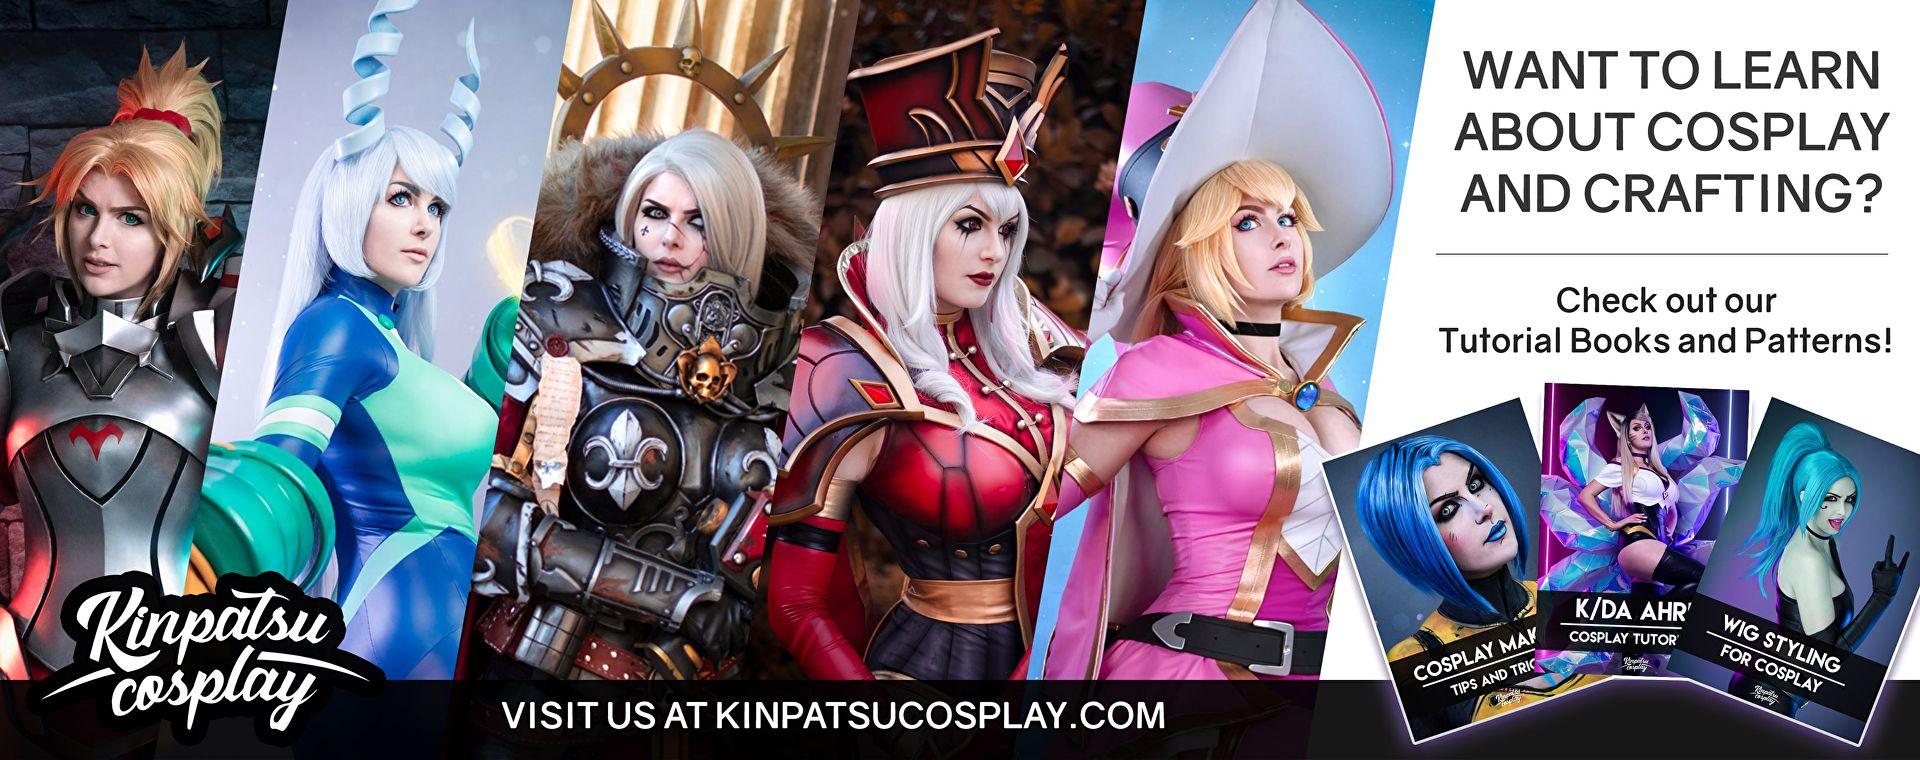 Kinpatsu-cosplay-books.jpg